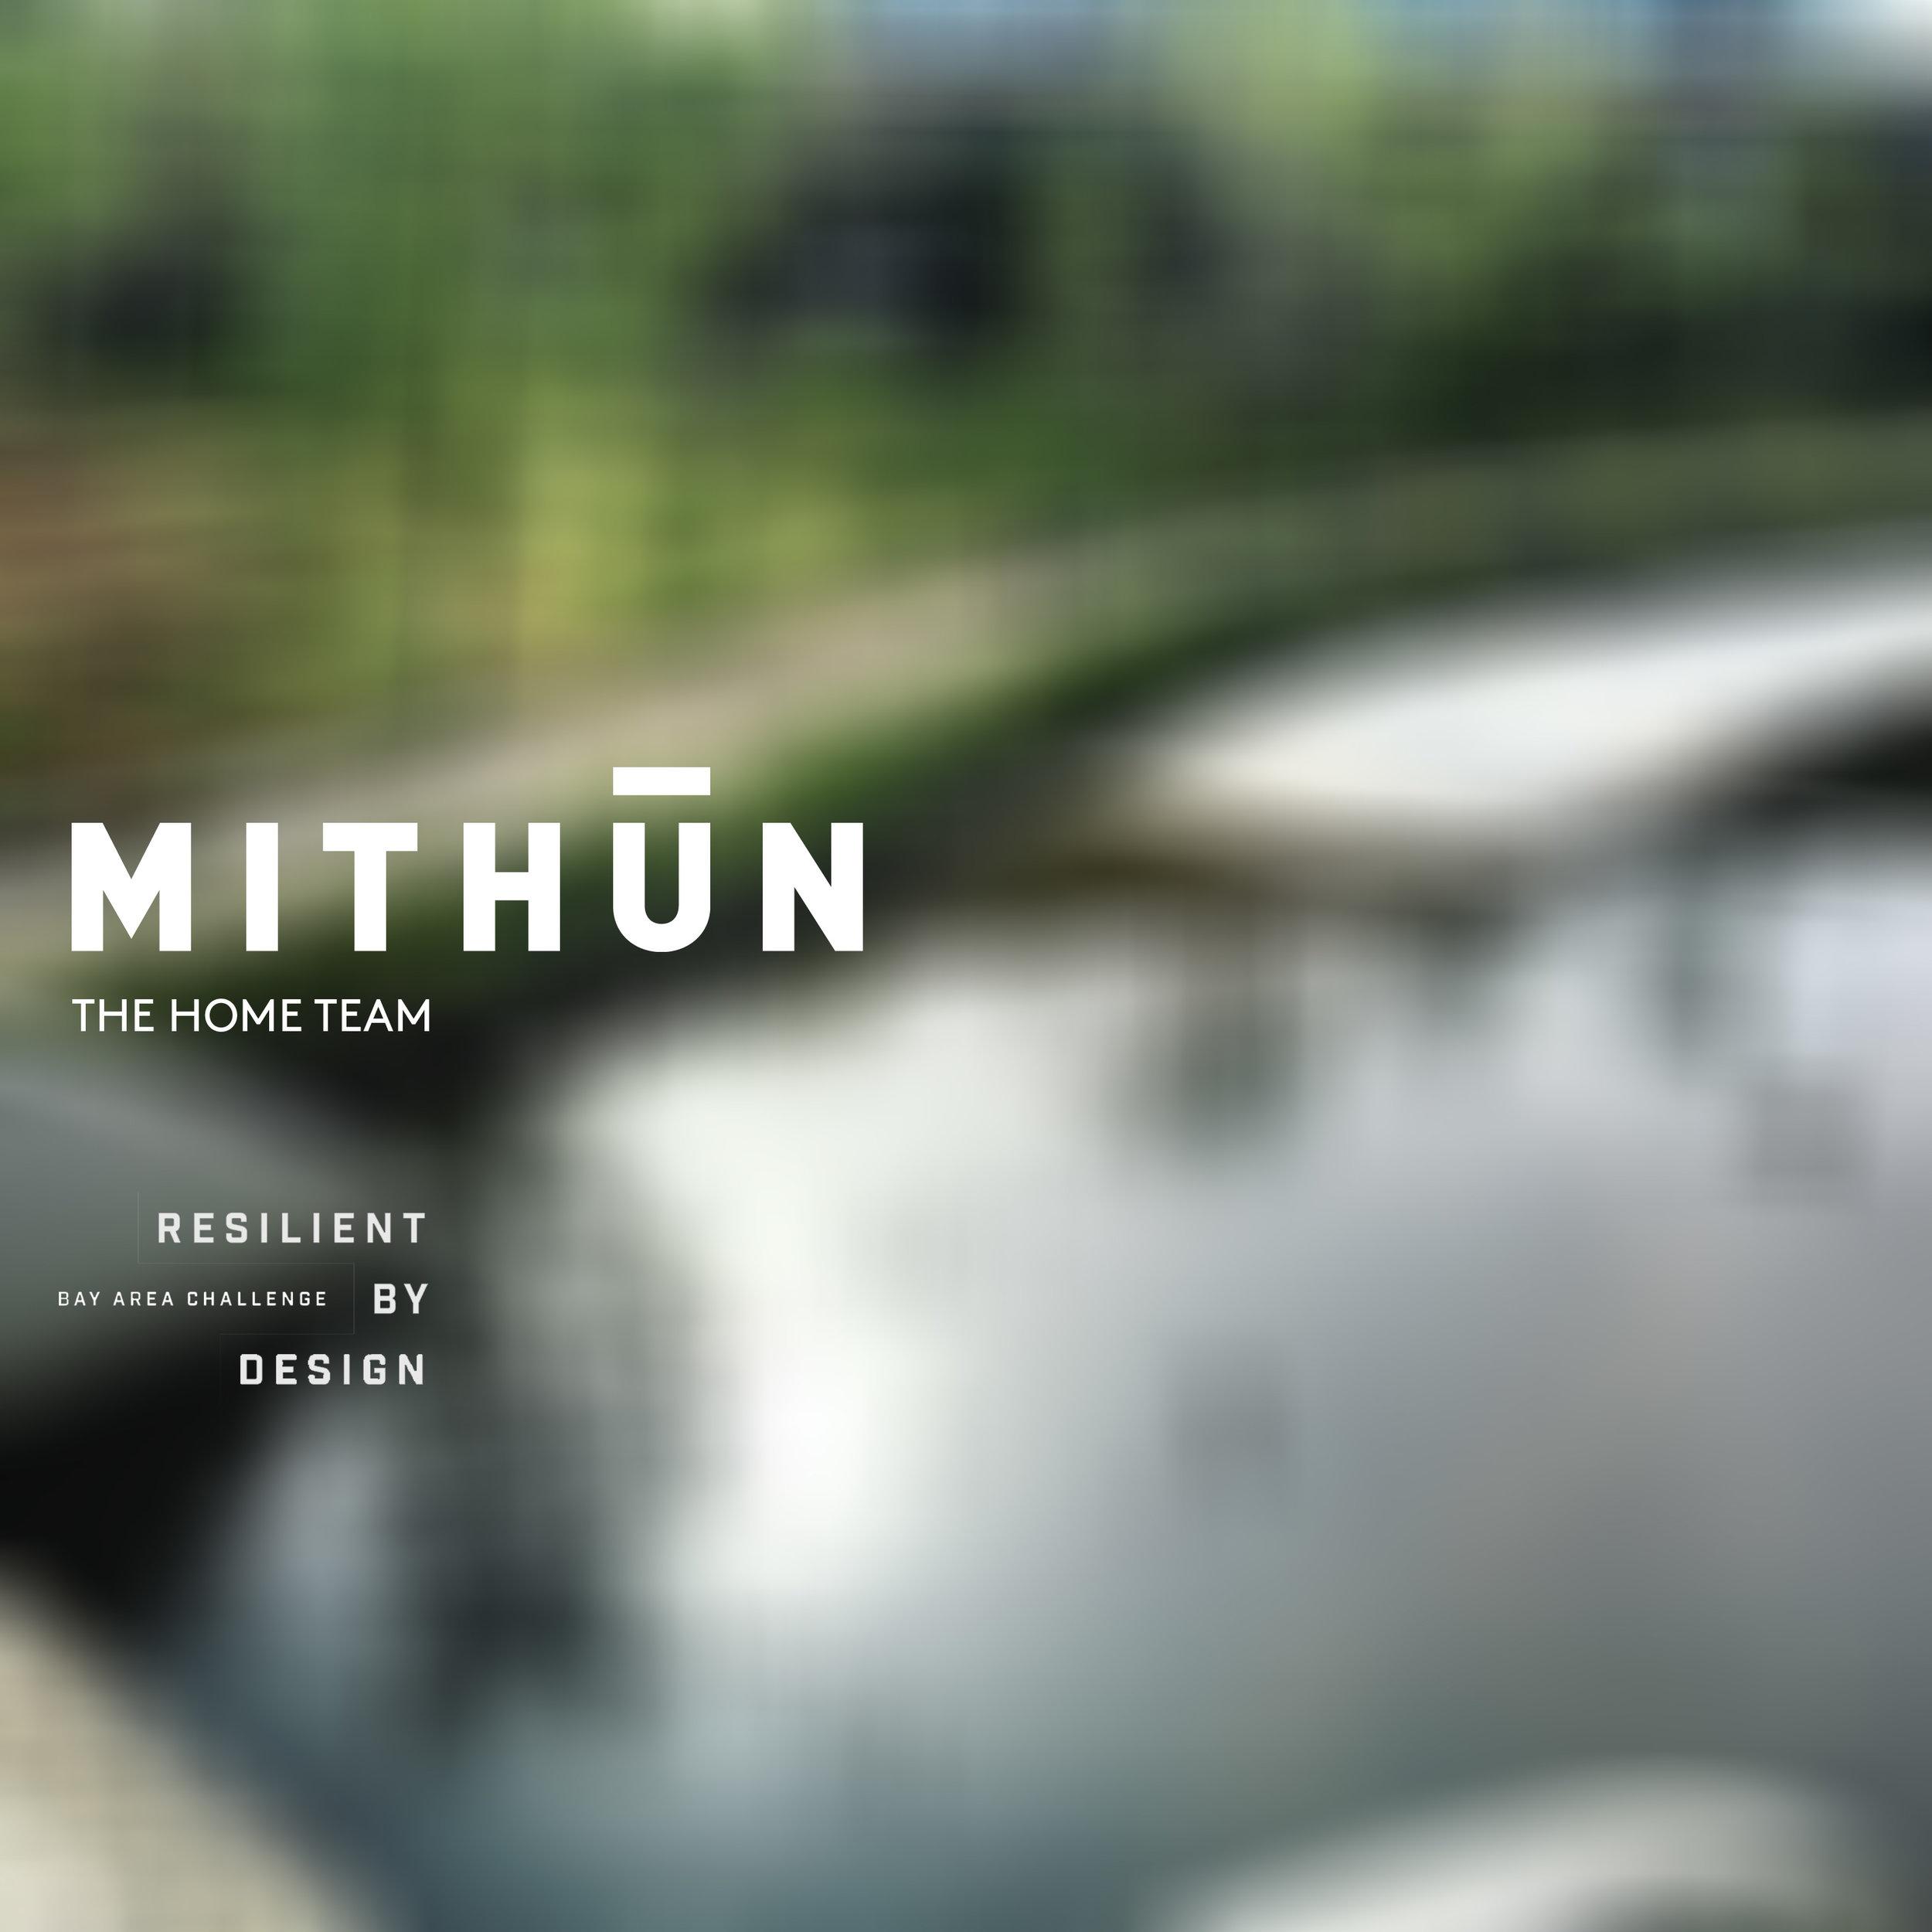 THE HOME TEAM - Mithun